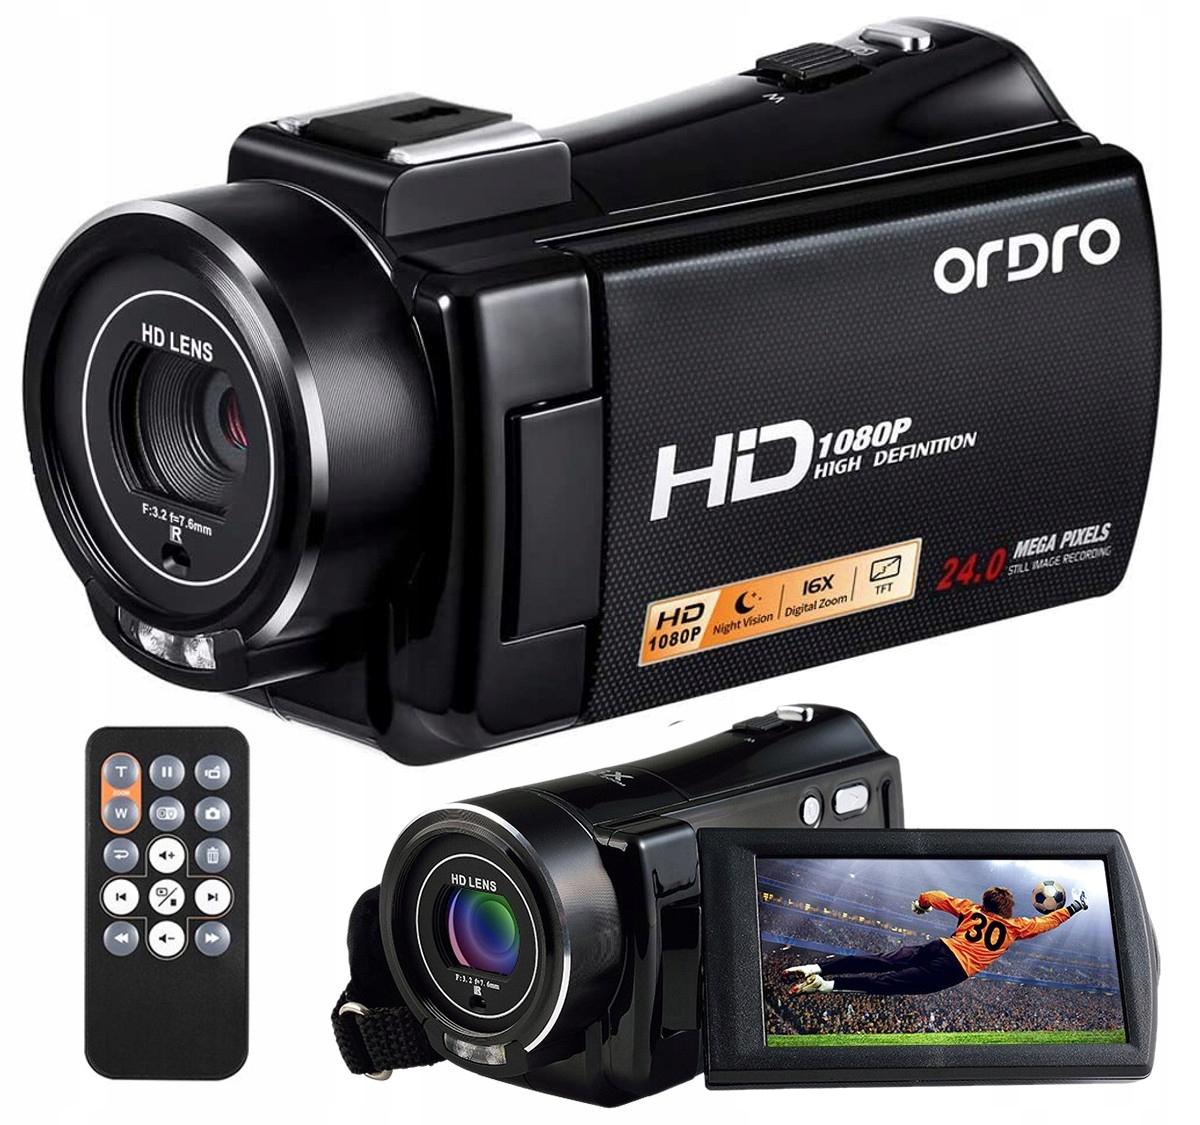 Kamera Cyfrowa Ordro HDV-V7 Fhd 24mpx 16x *GTU6*